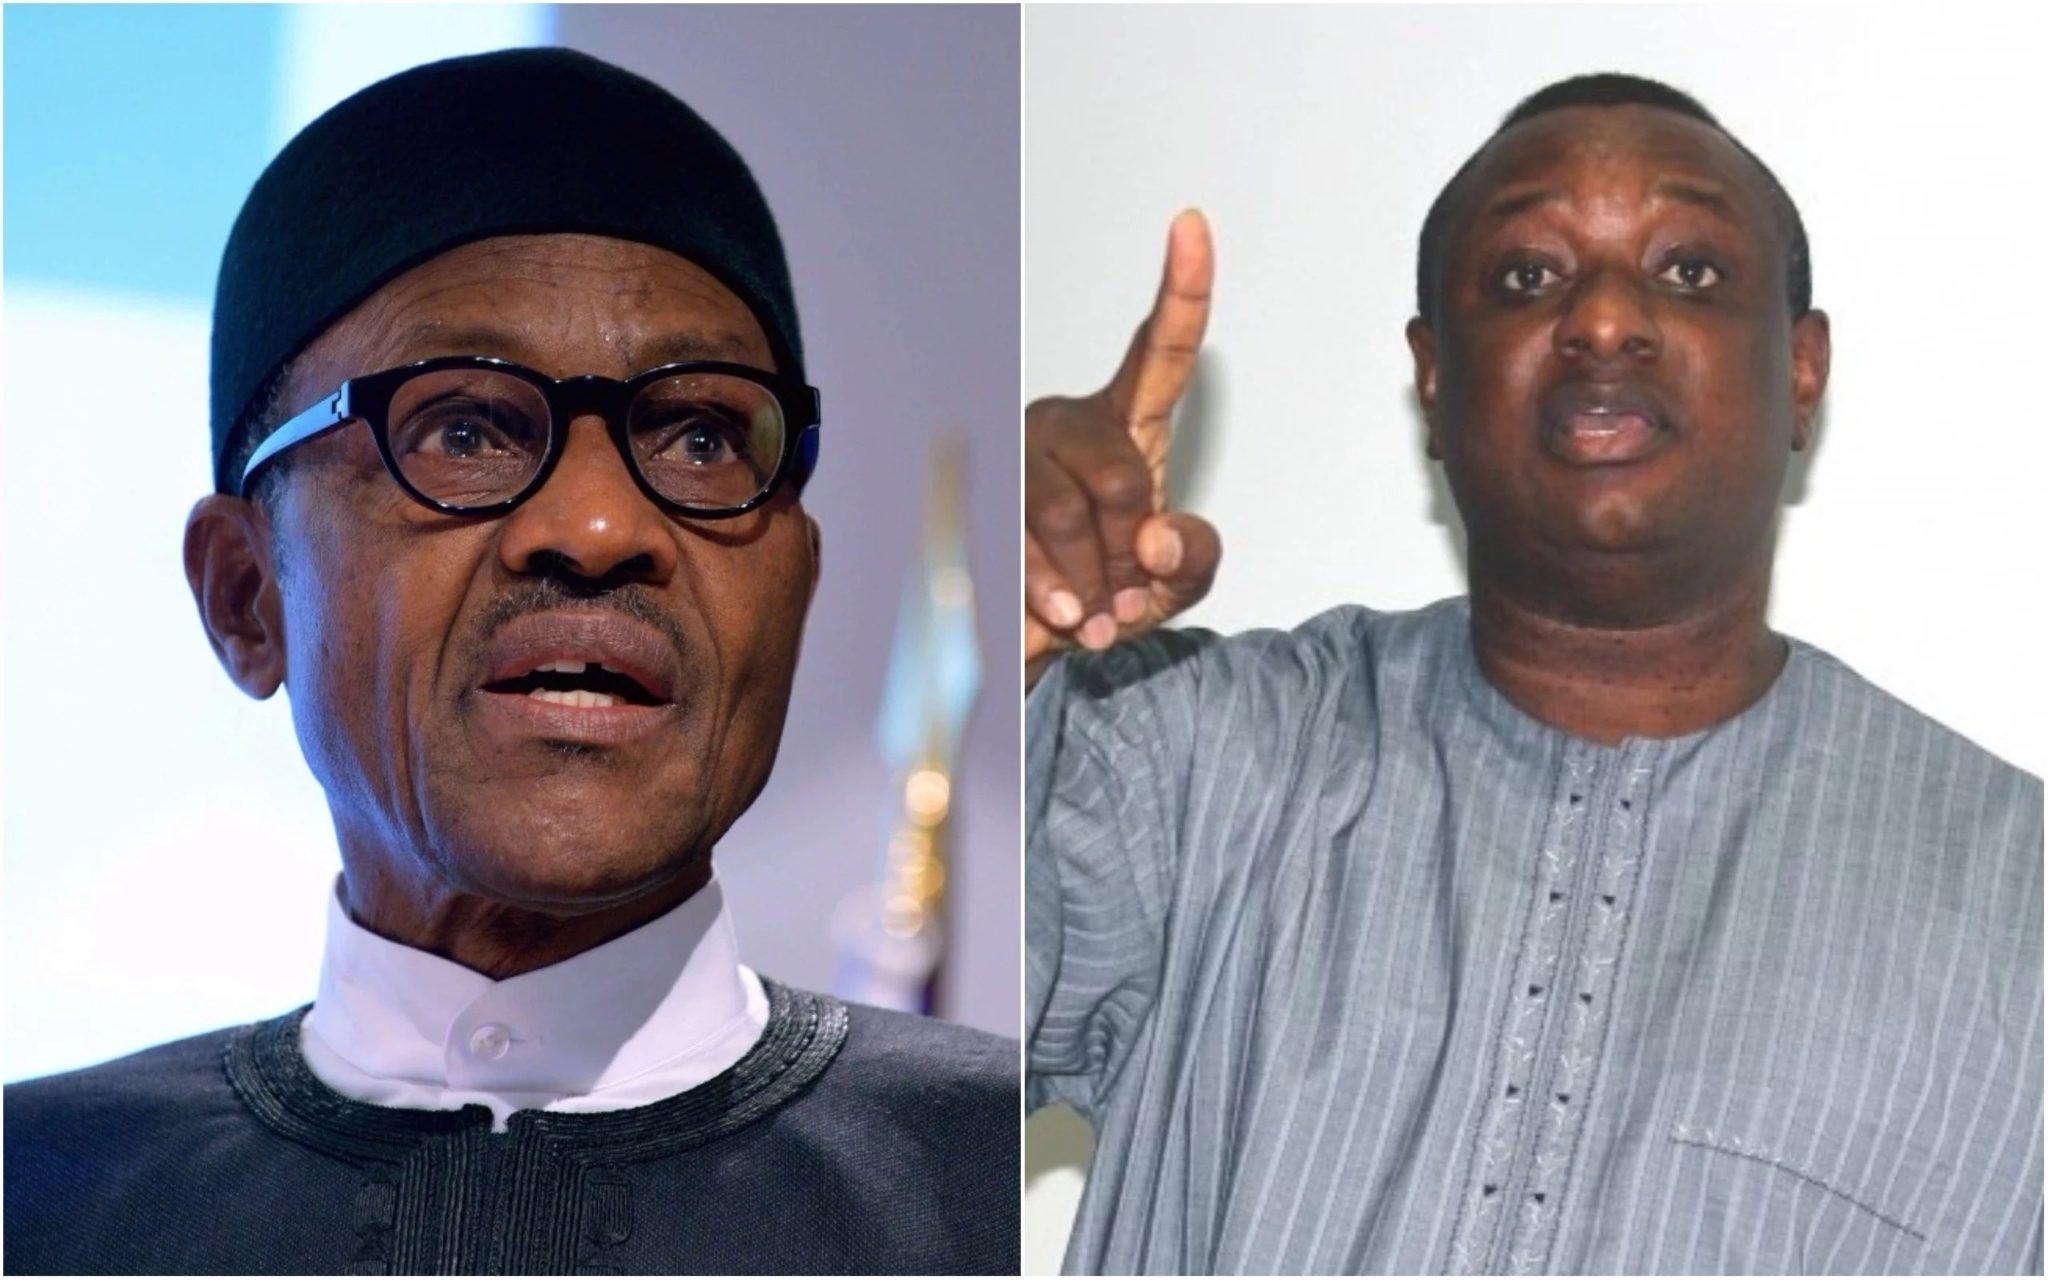 Buhari has done well in job creation - Festus Keyamo lindaikejisblog